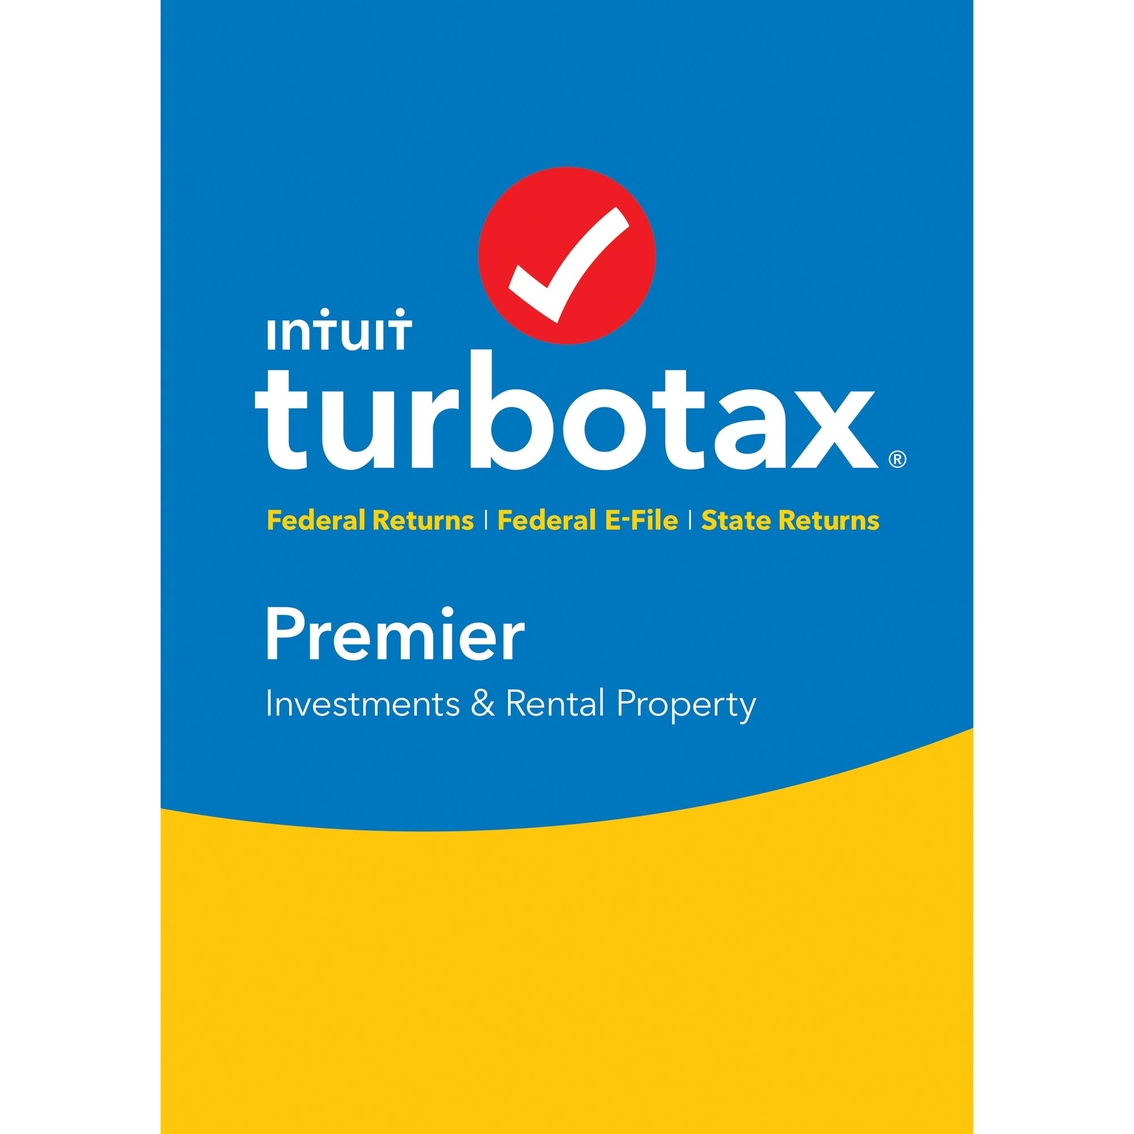 Intuit Turbotax Premier 2016.